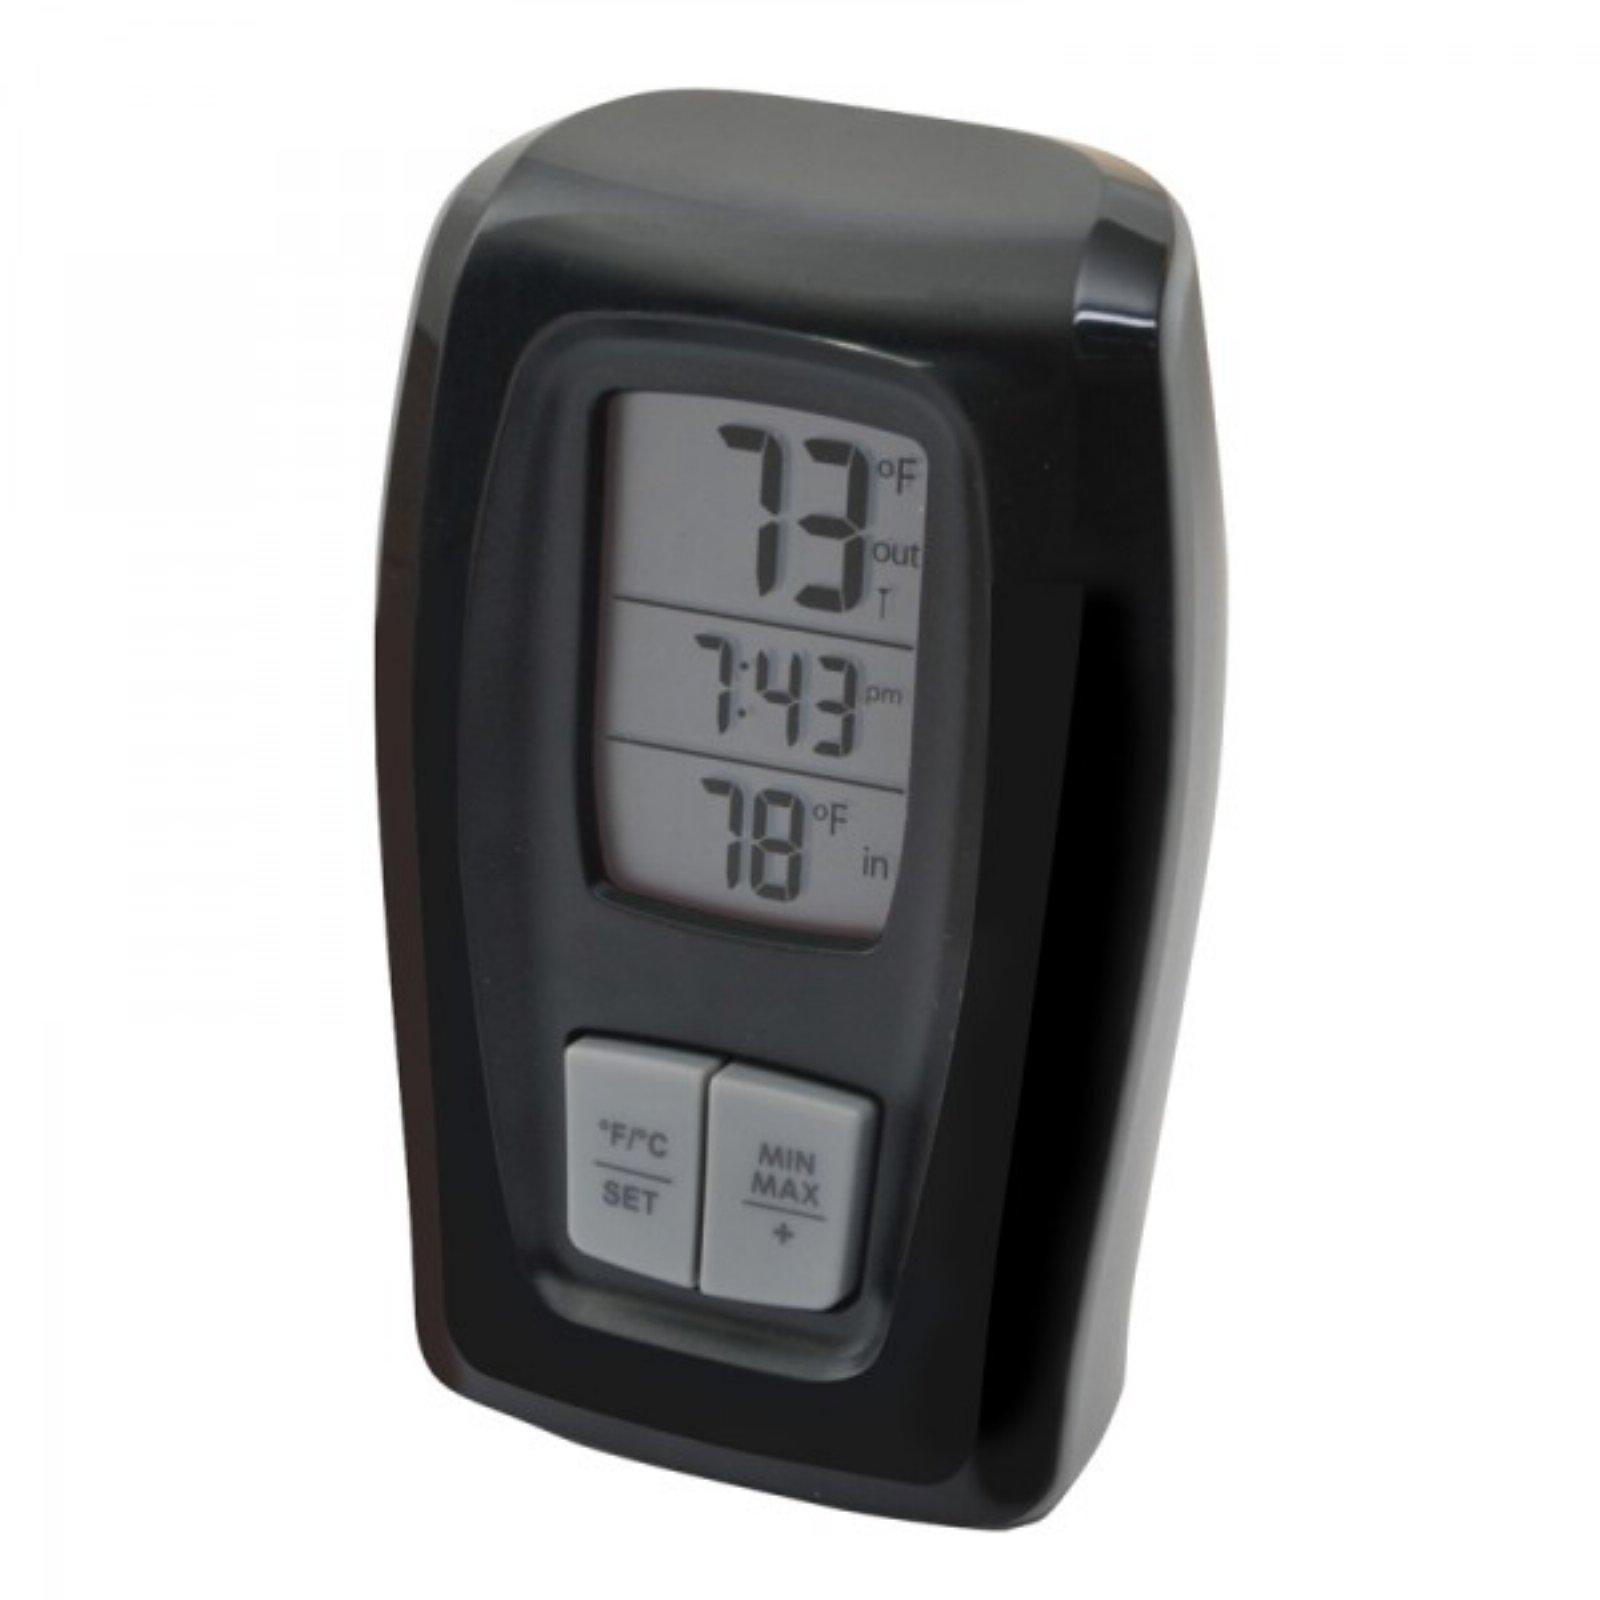 AcuRite Digital Indoor/Outdoor Thermometer Clock